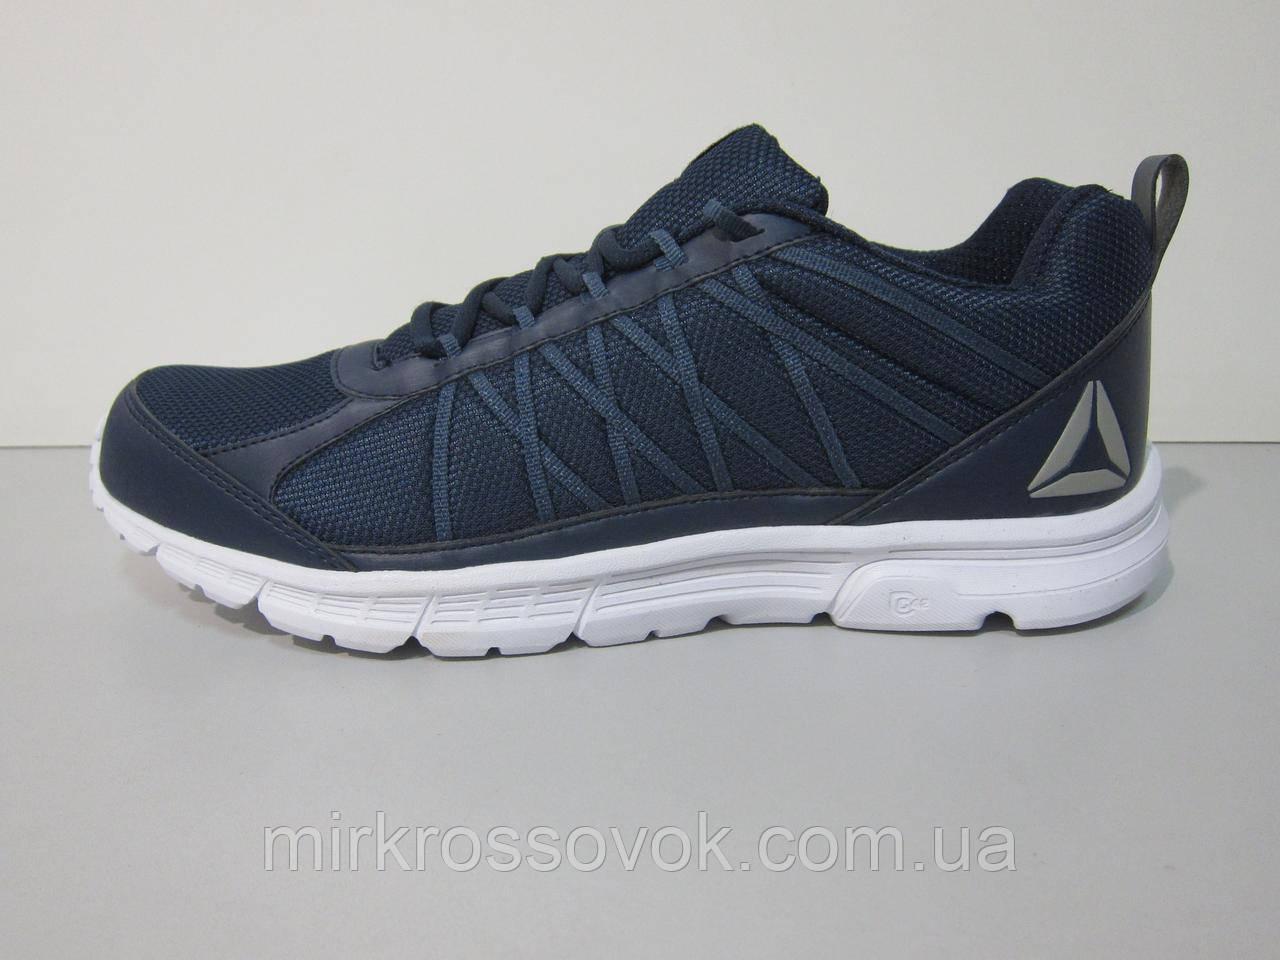 33711bd10 Кроссовки мужские ( 31см 47р ) Reebok Speedlux 2,0 (BS8462) (оригинал